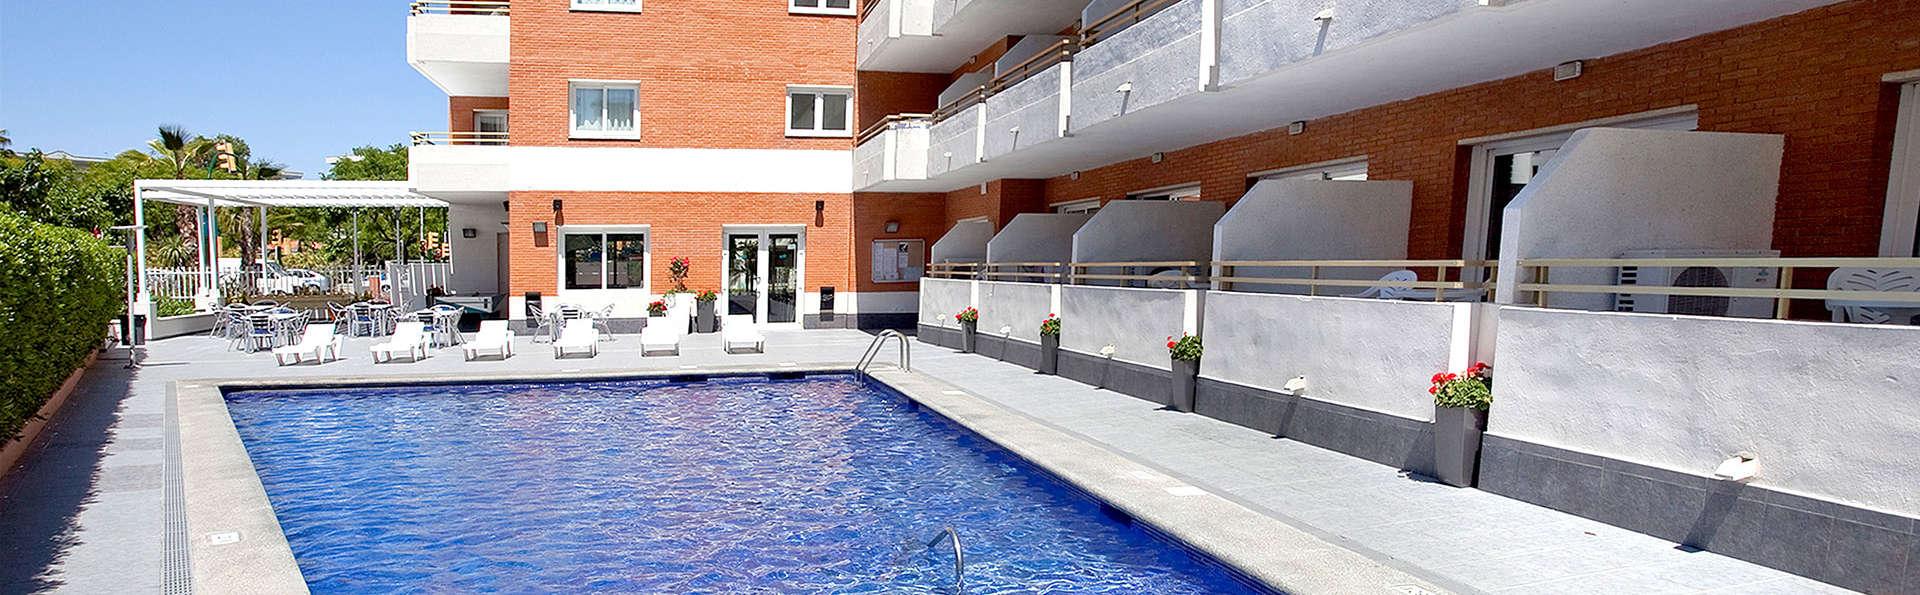 Les Dàlies - Blaumar Apartaments - Edit_Pool2.jpg